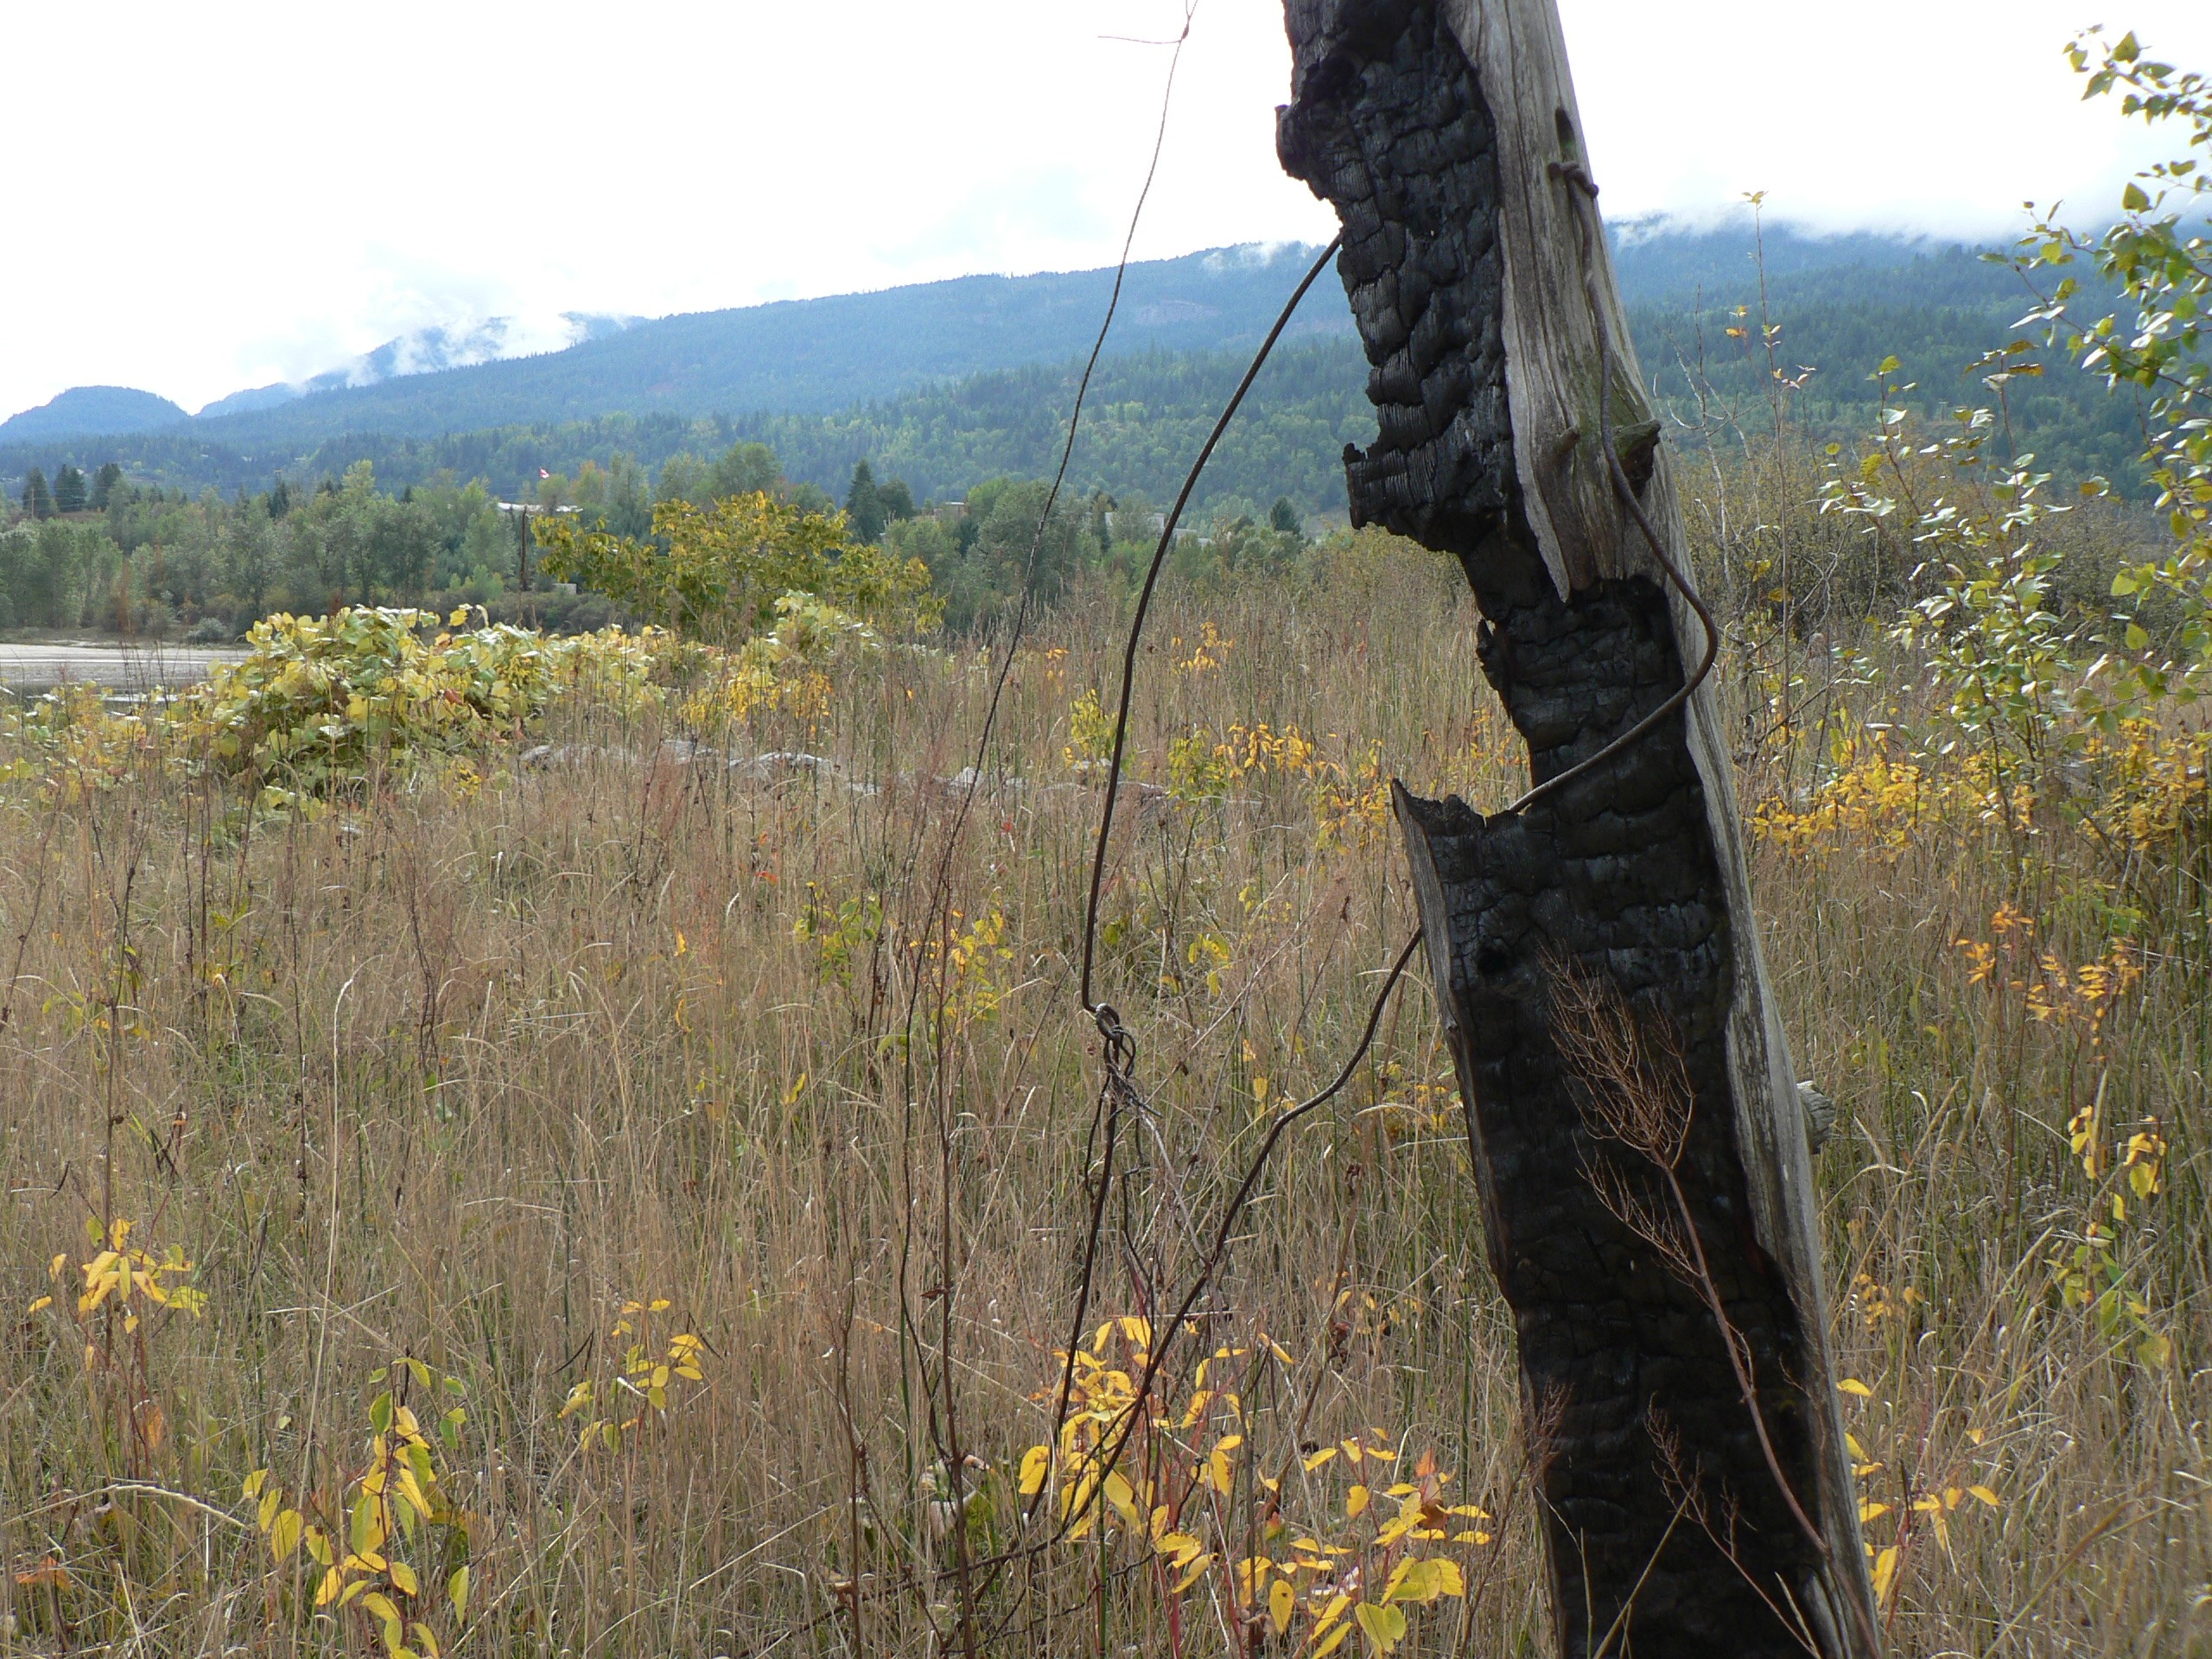 sinixt village site in british columbia